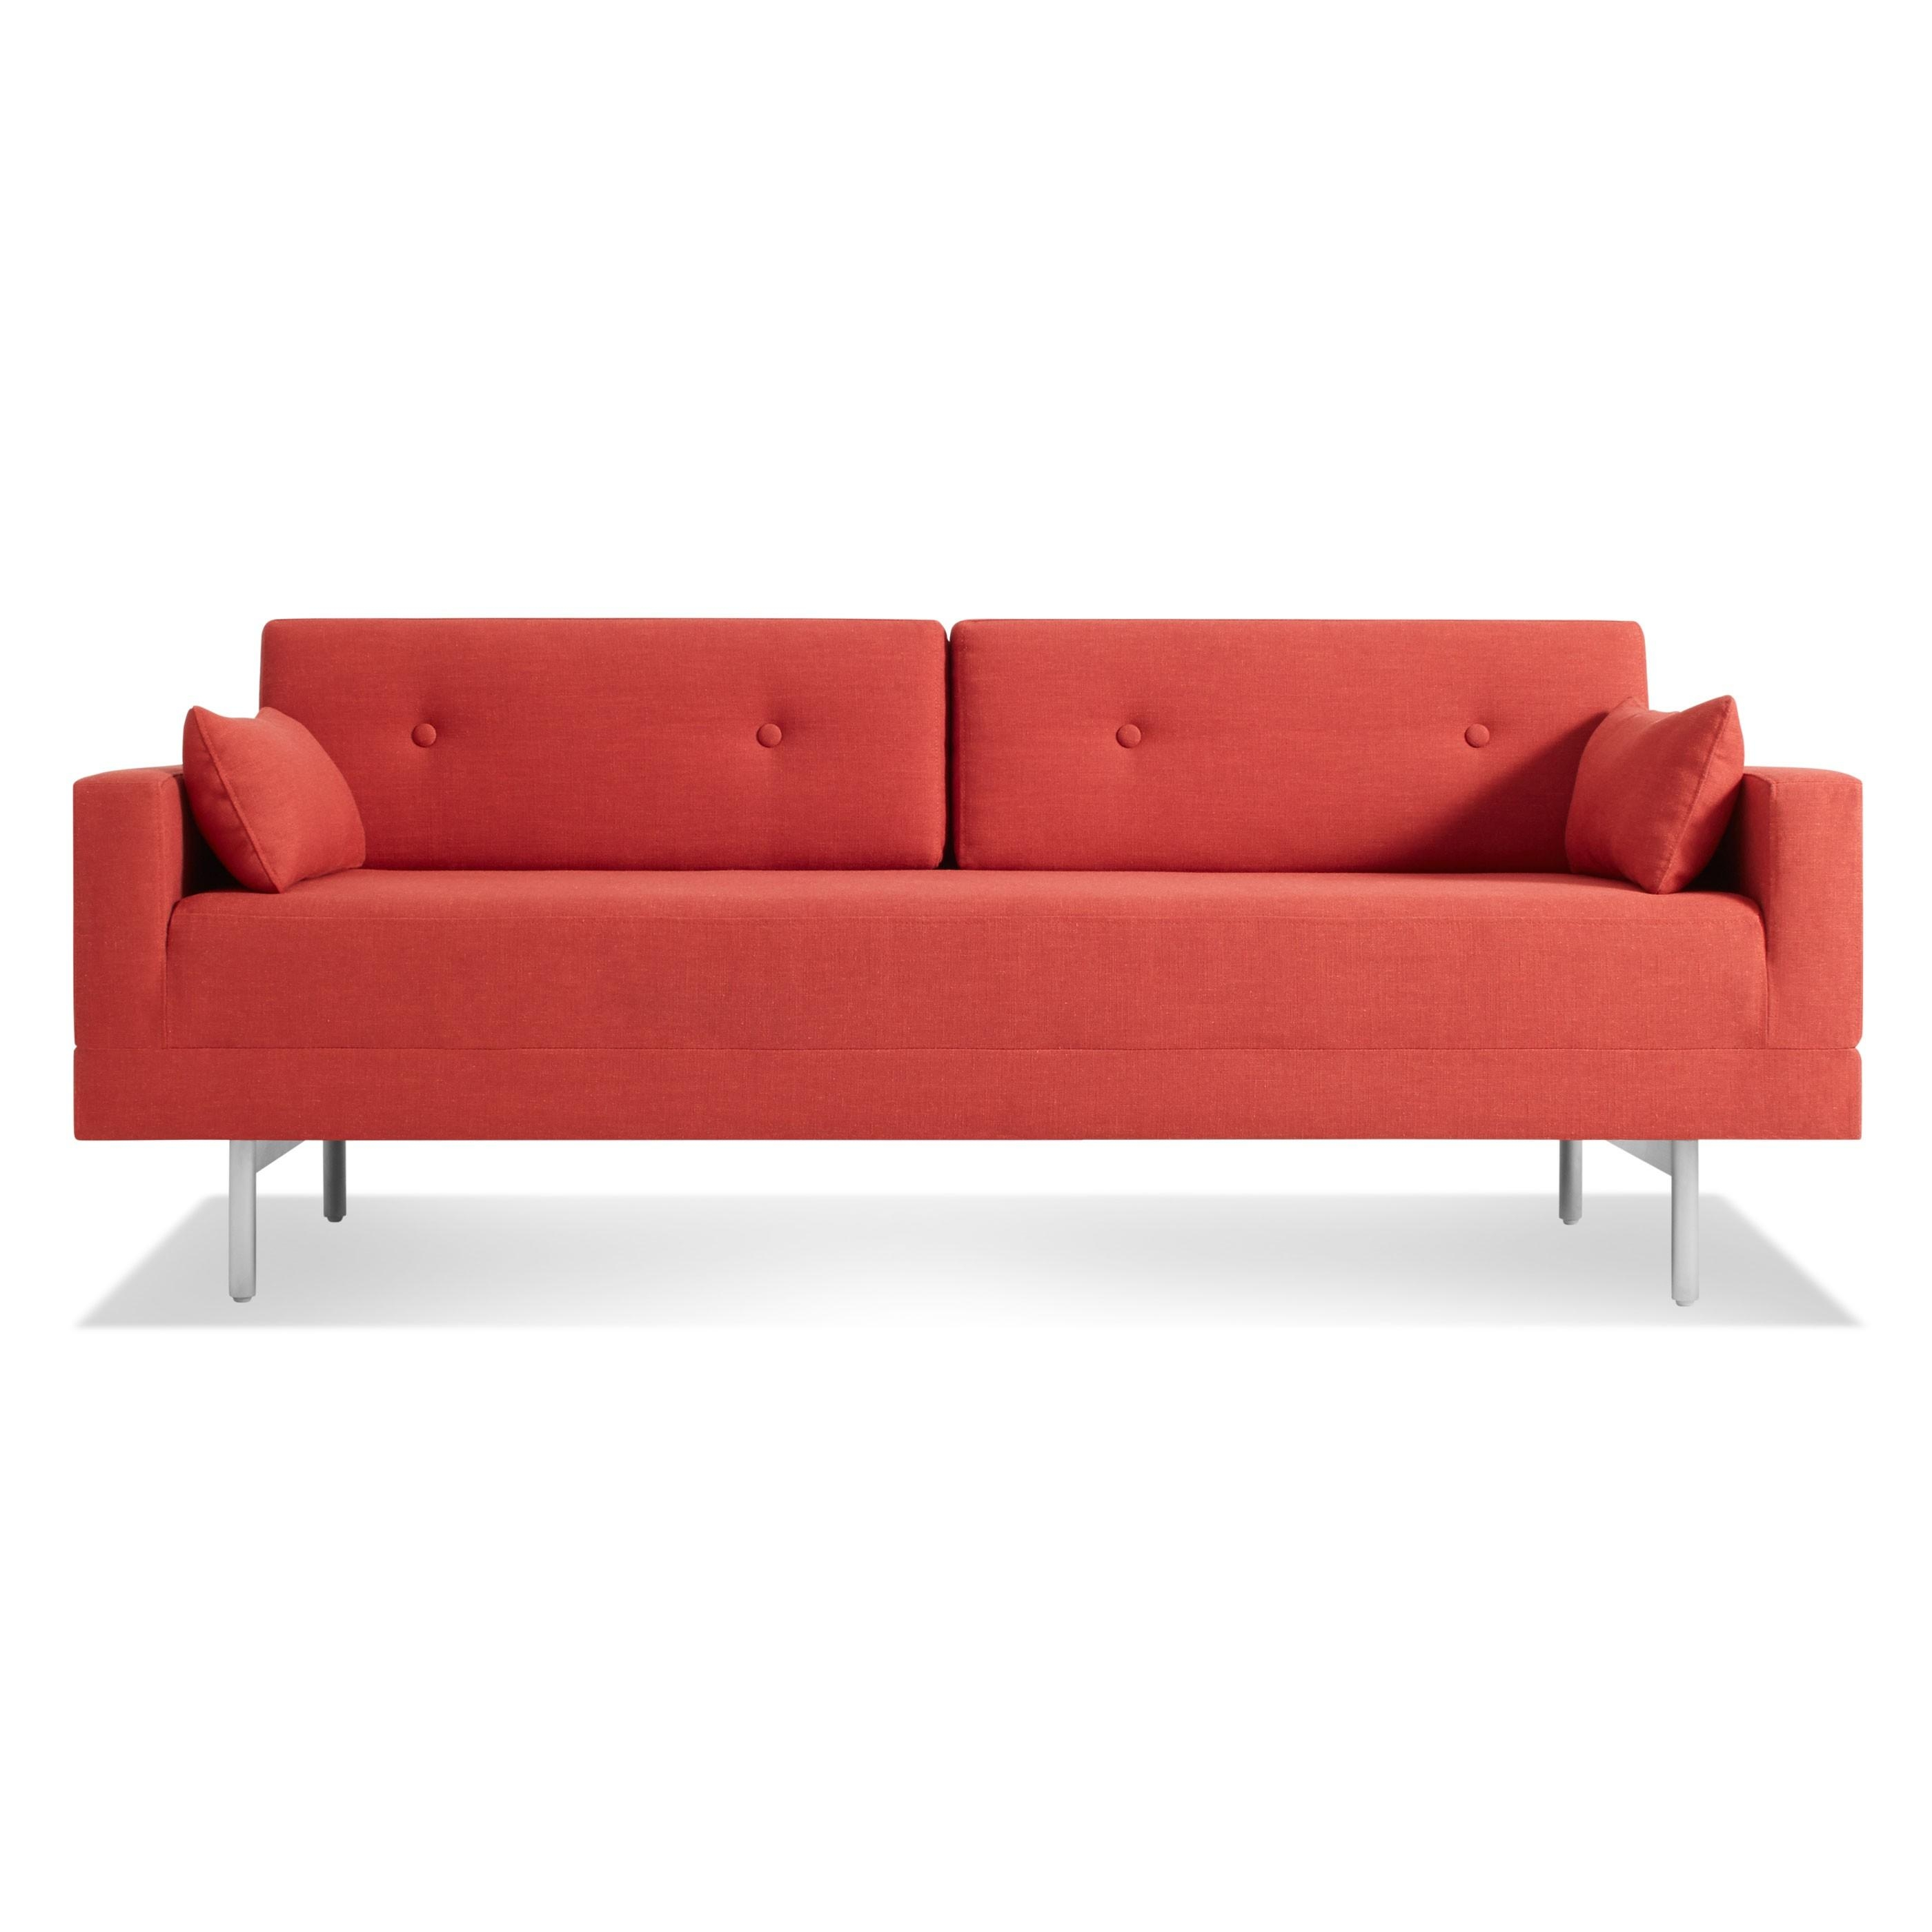 Sleeper Sofa – Diplomat Convertible Sofa | Blu Dot Inside Slipper Sofas (View 20 of 20)